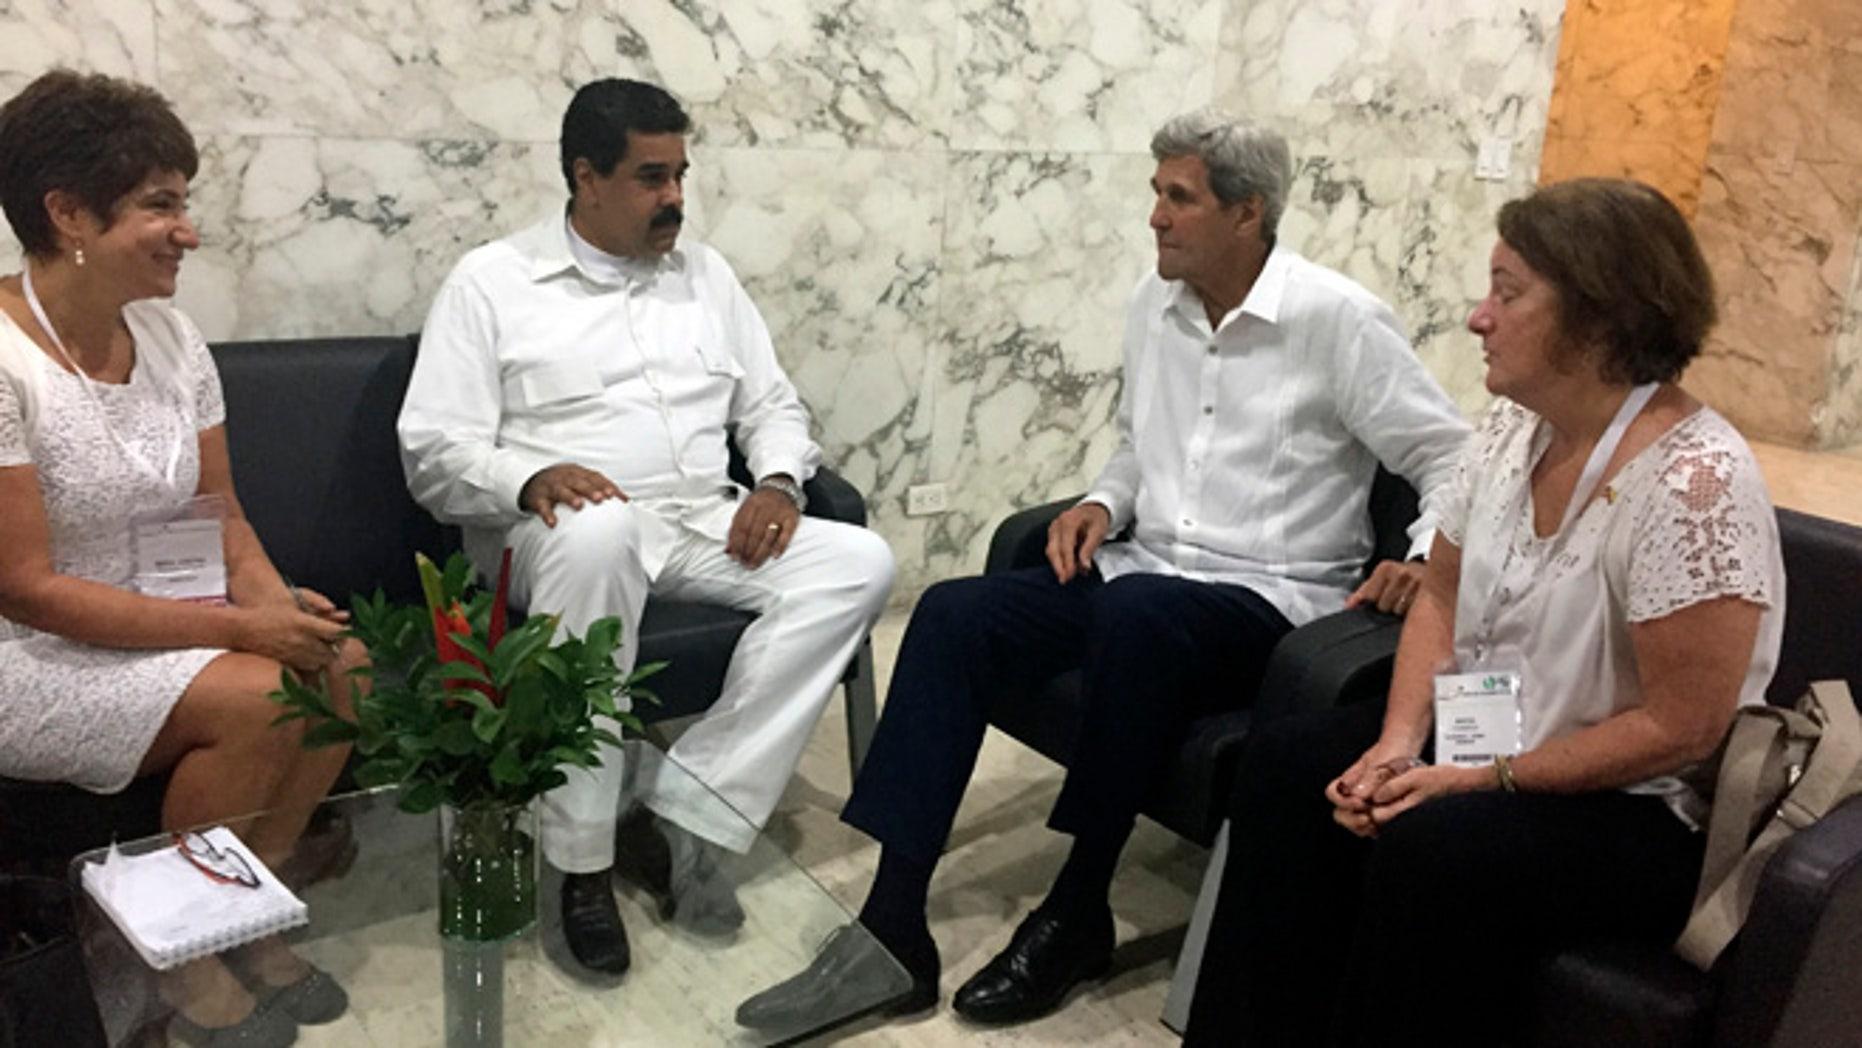 U.S. Secretary of State John Kerry meets with Venezuela president Nicolas Maduro in Cartagena, Colombia Monday, Sept. 26, 2016. (AP Photo/Vivian Salama)